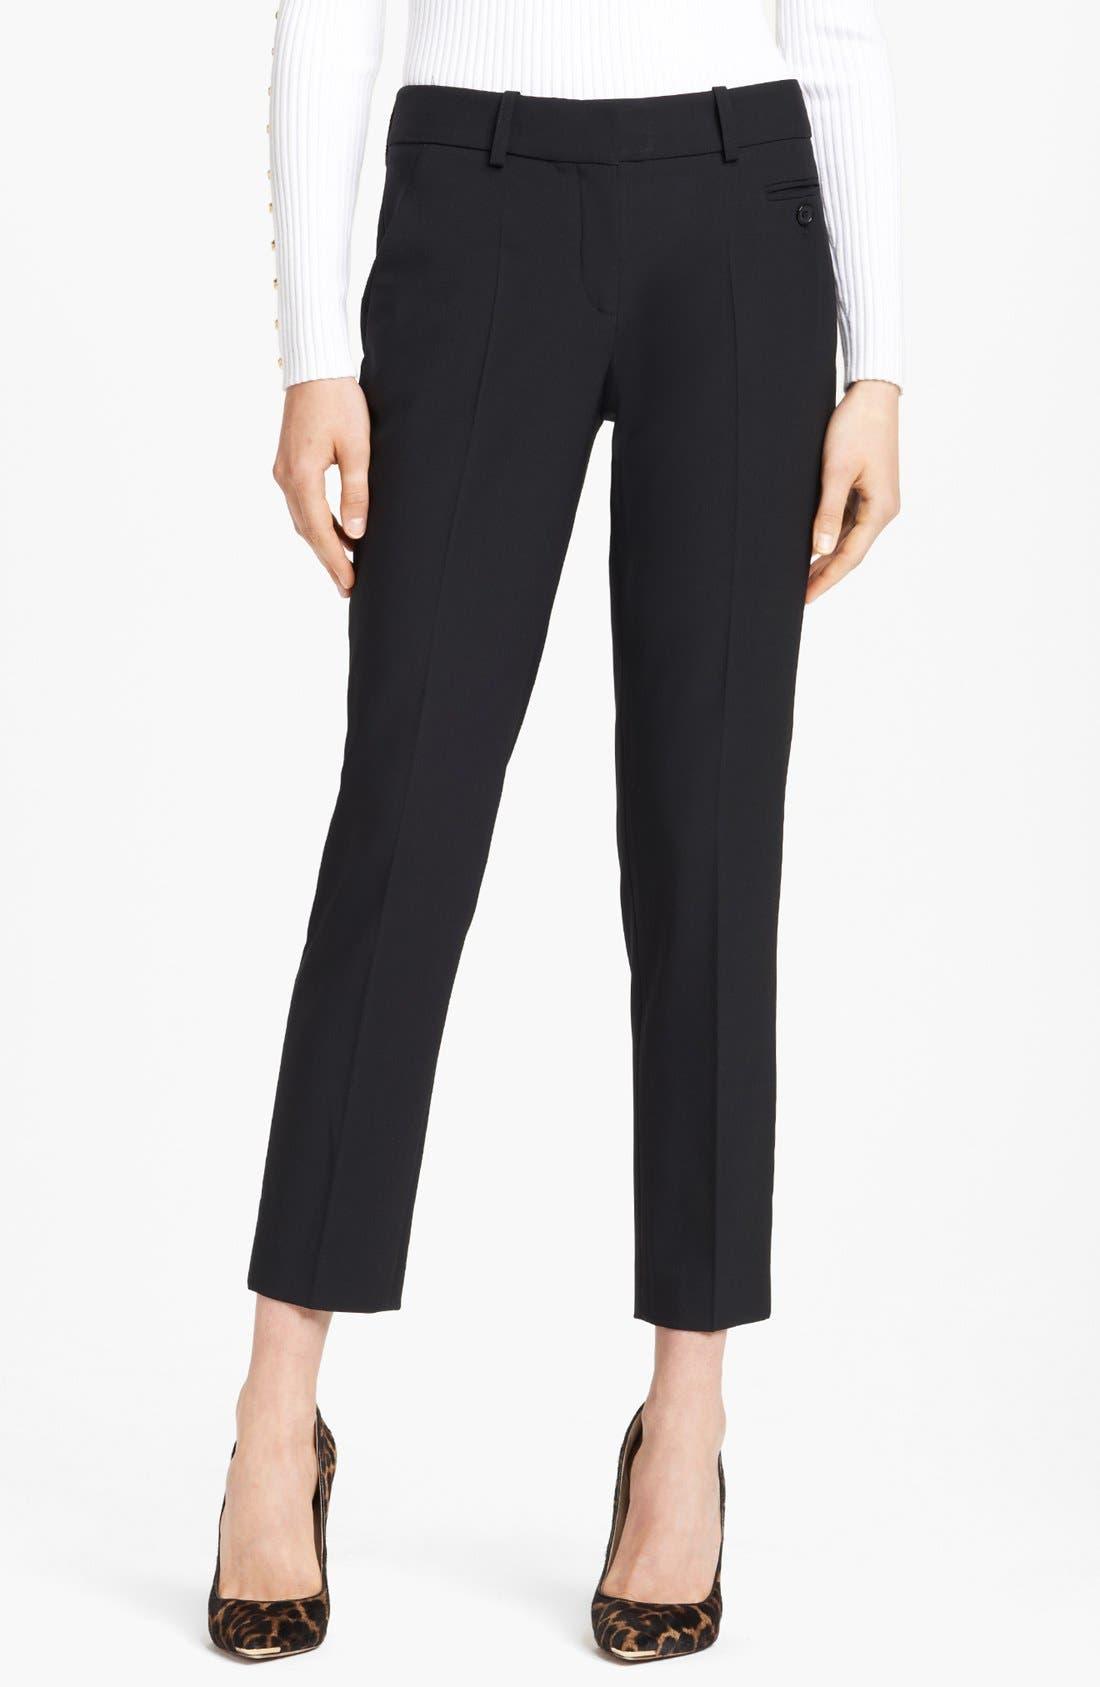 Main Image - Michael Kors 'Samantha' Skinny Stretch Wool Pants